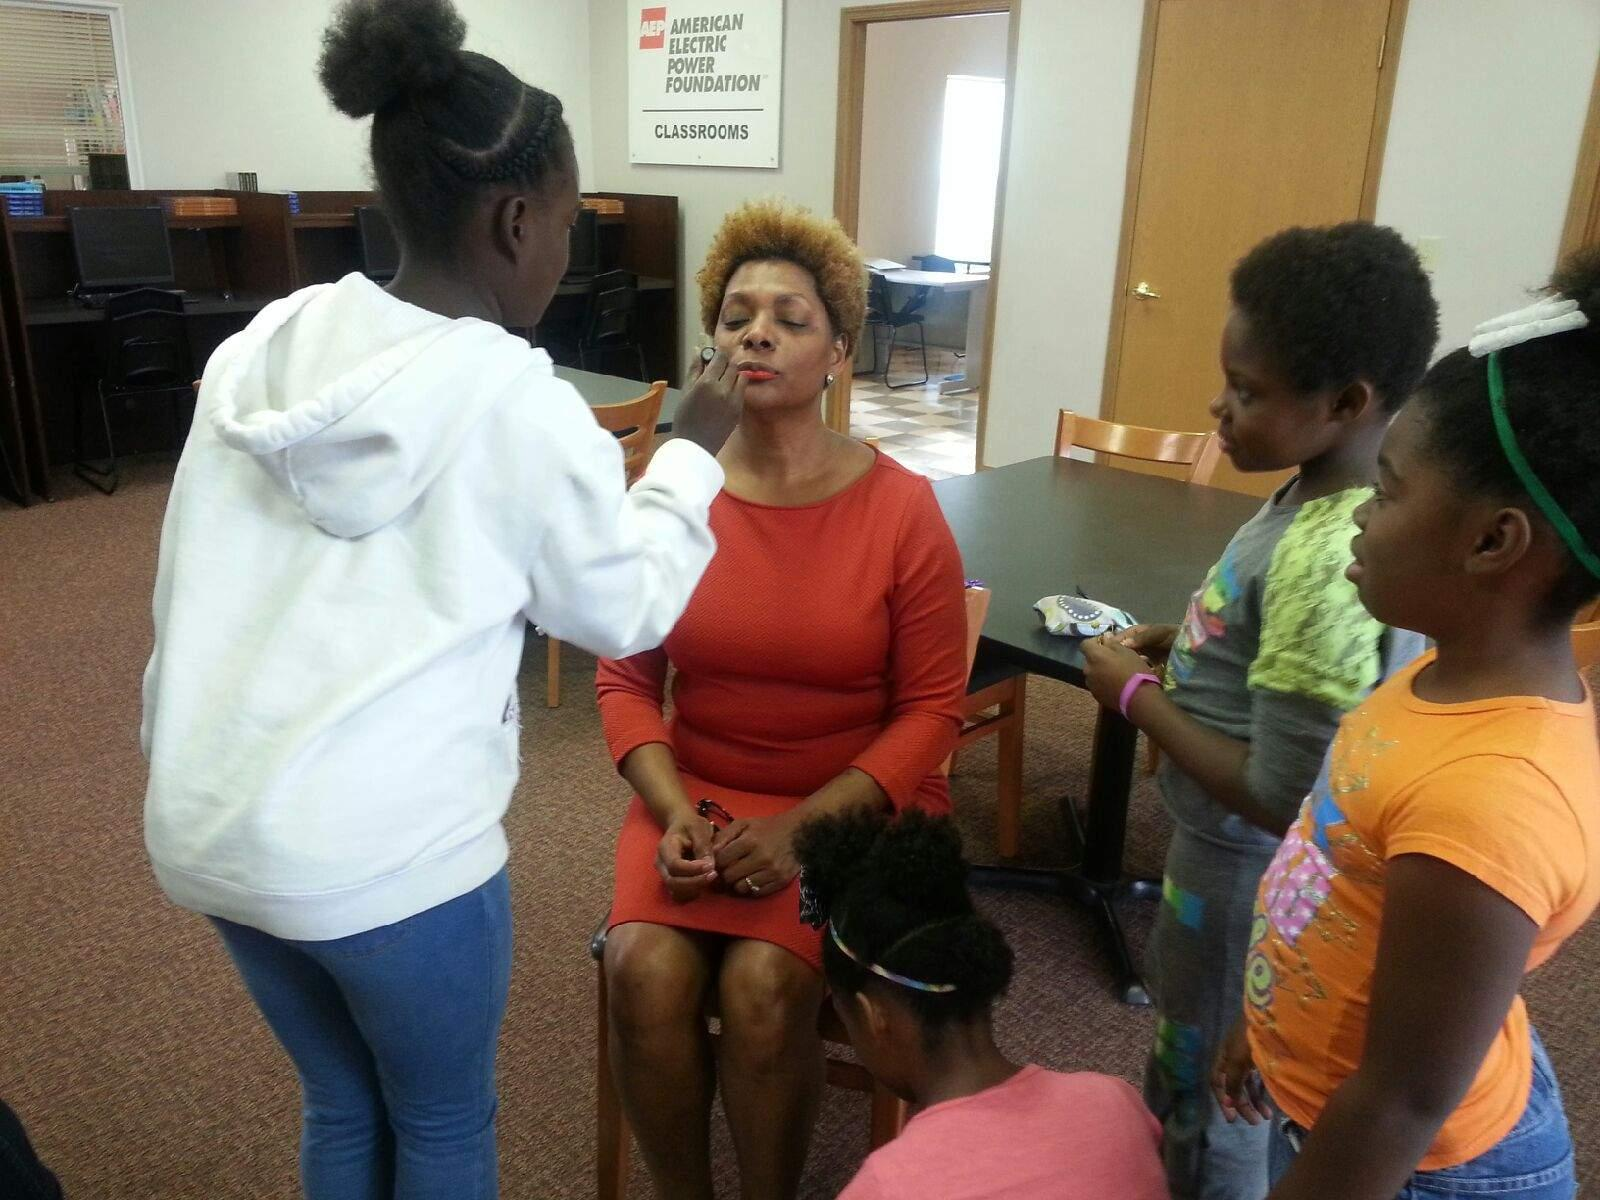 Resident children apply makeup